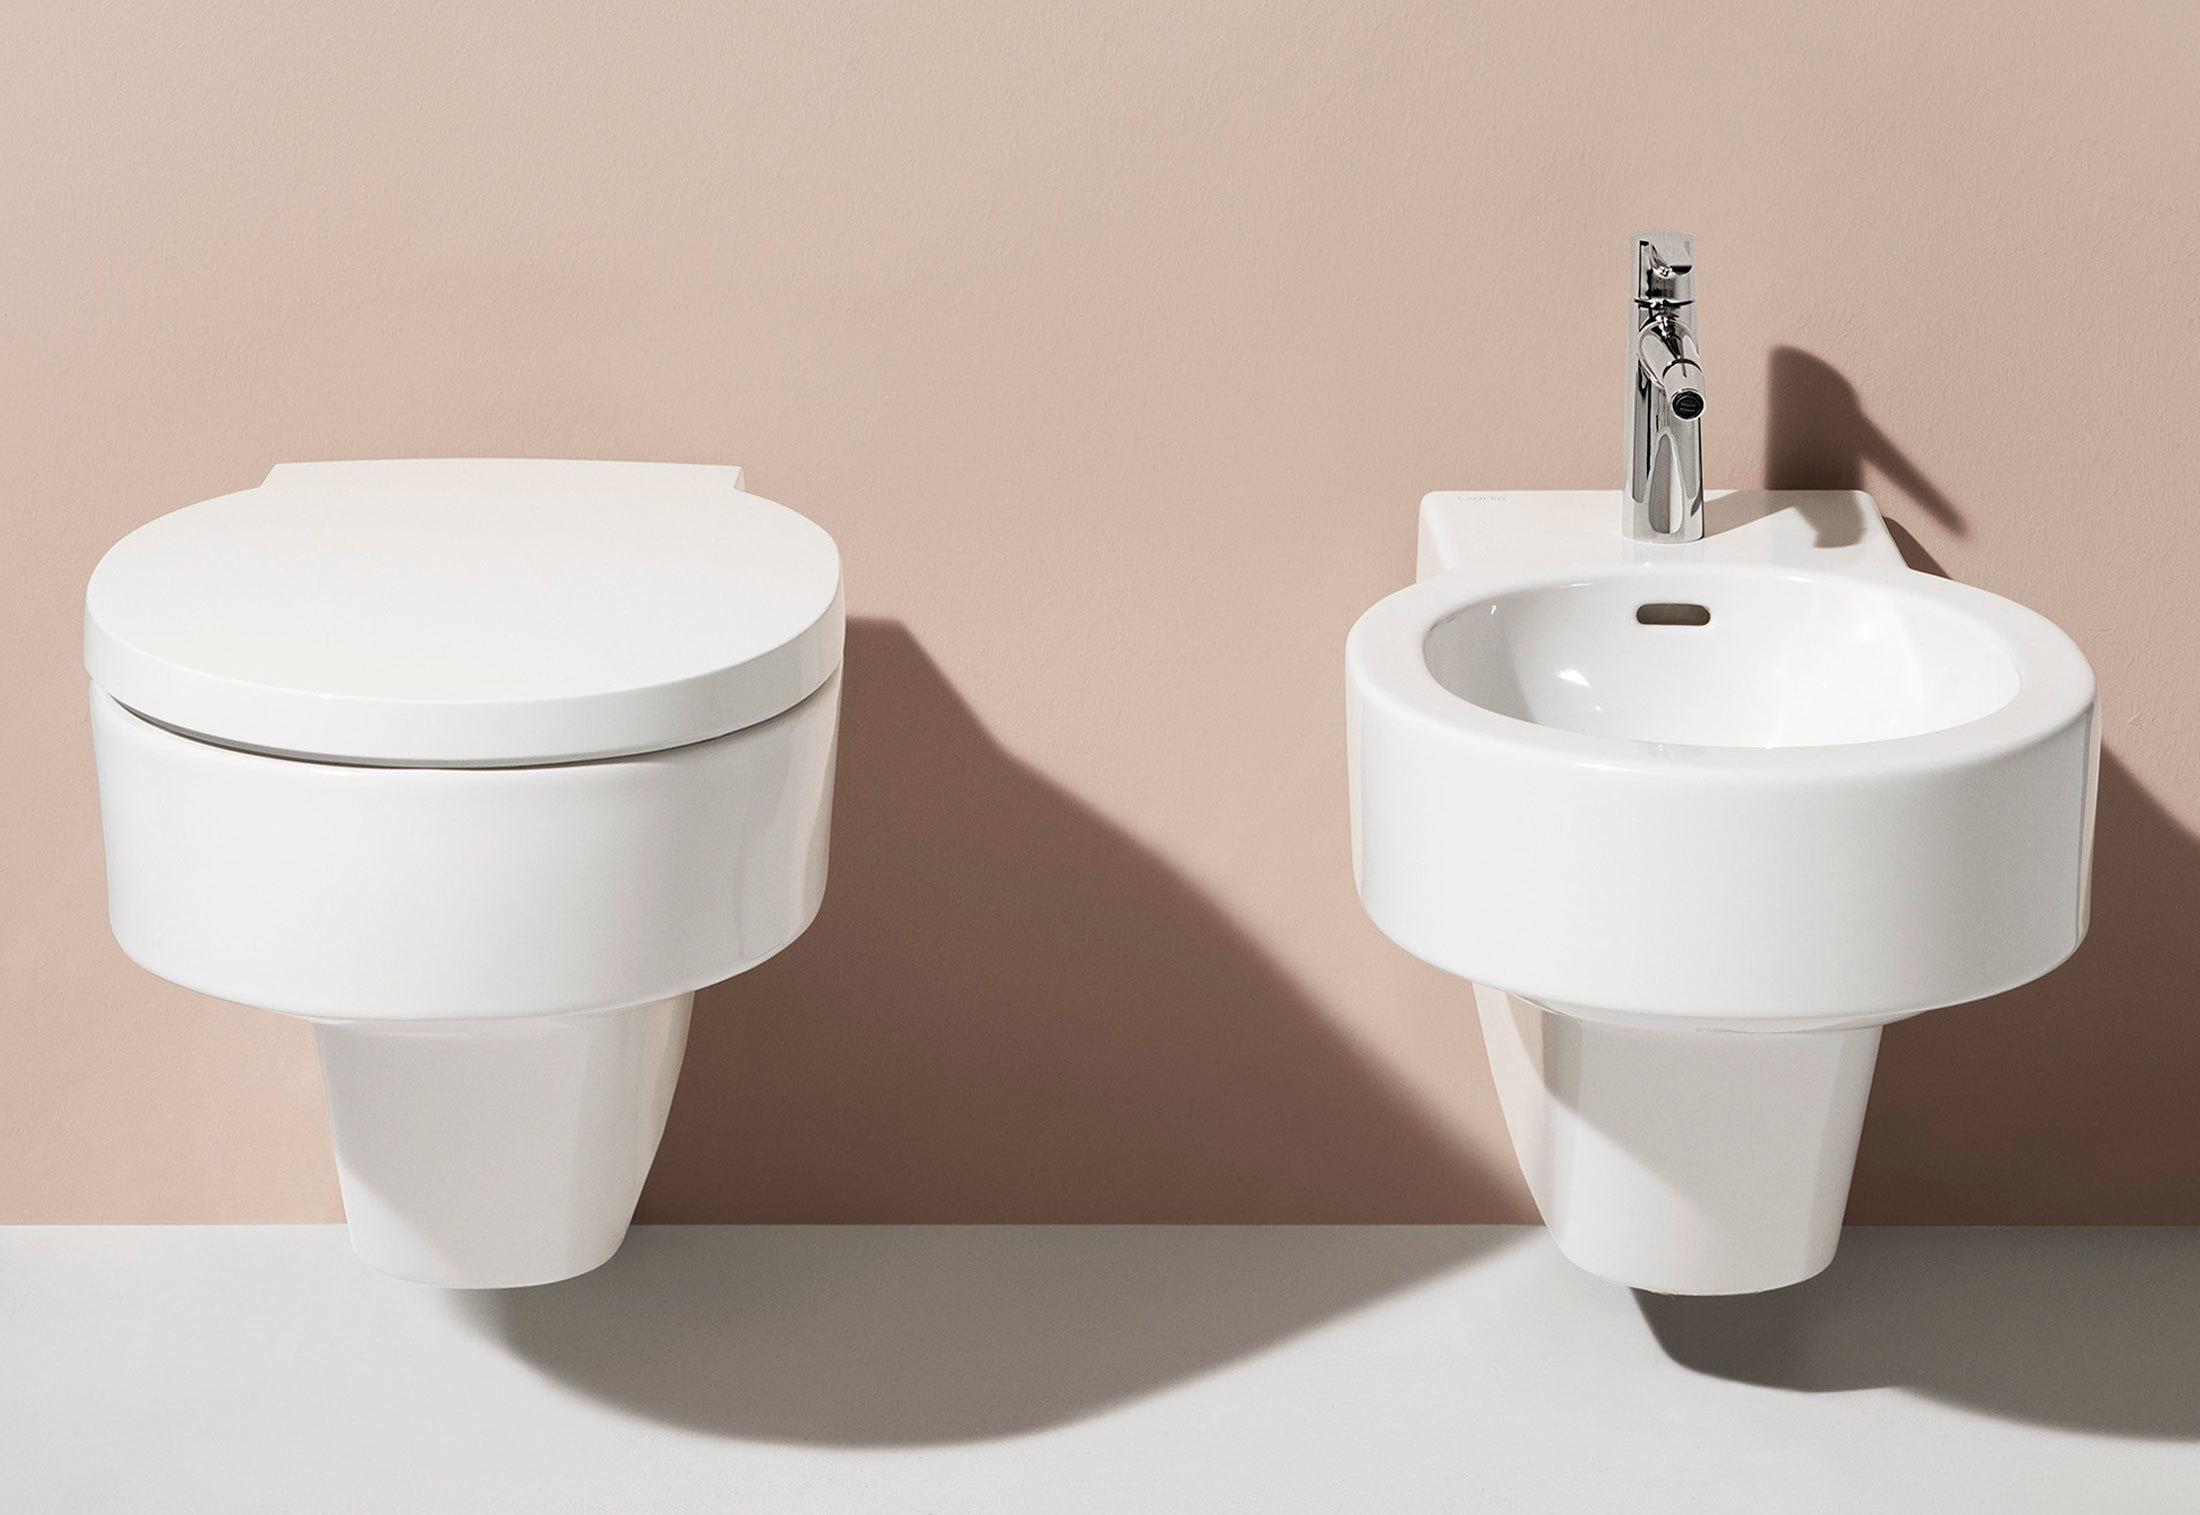 randlose wc becken great keramag wcsitz icon mit with randlose wc becken good haenge wc. Black Bedroom Furniture Sets. Home Design Ideas